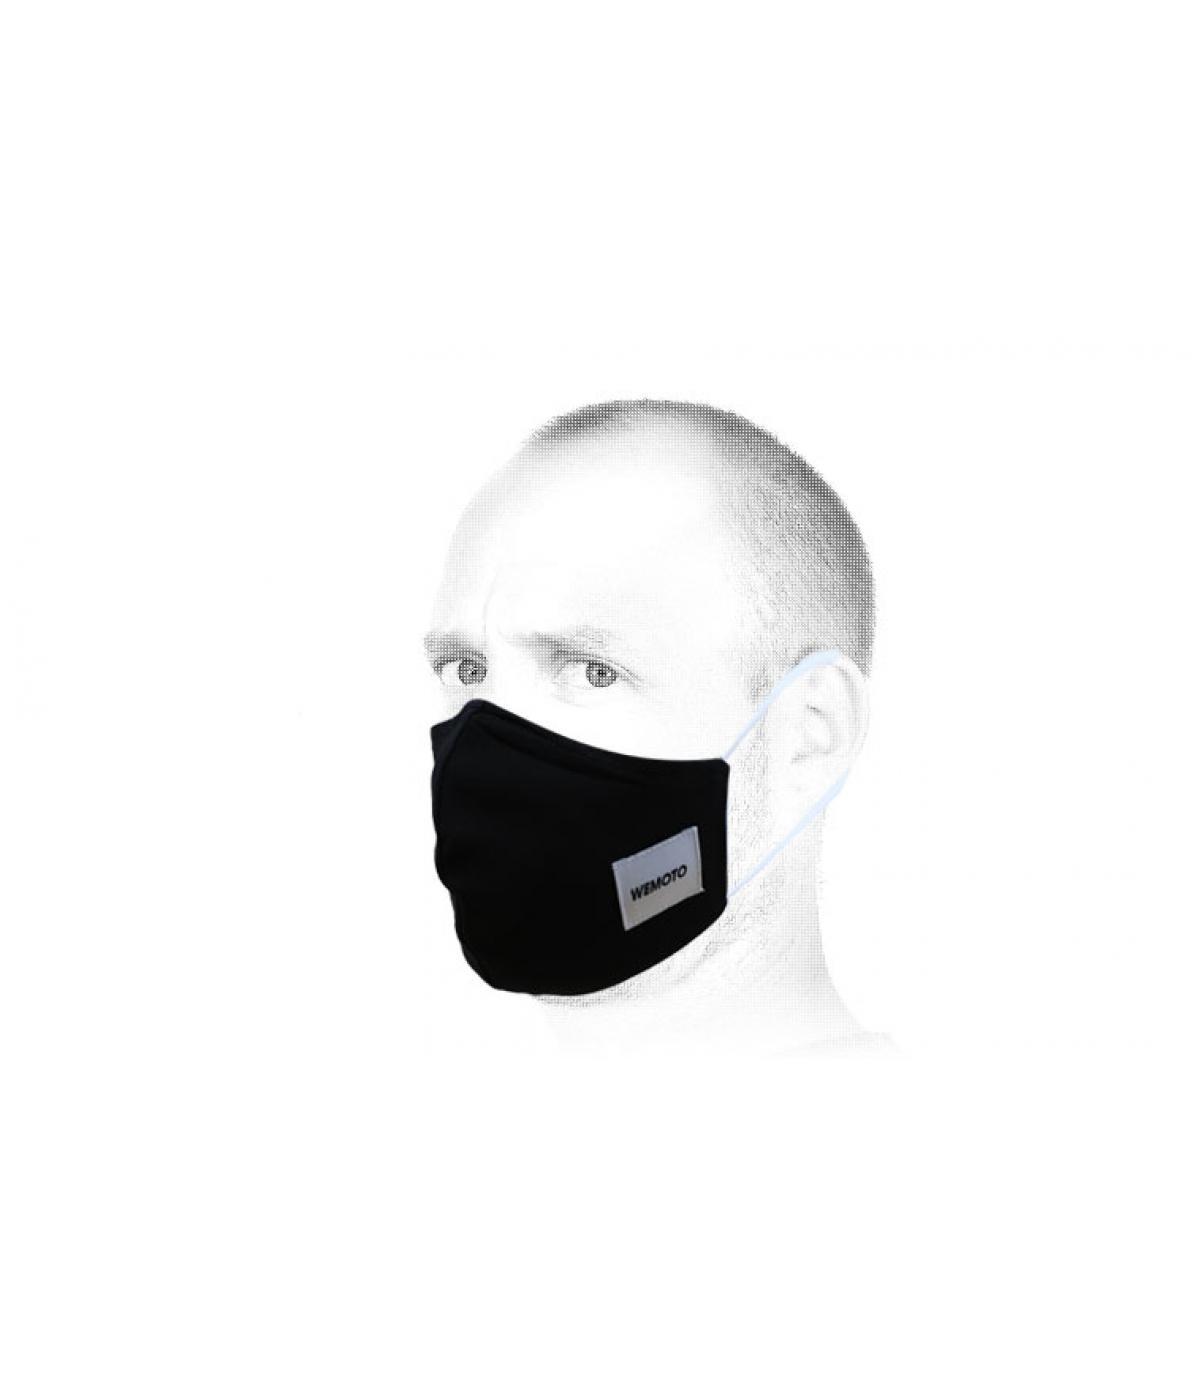 Masque noir Wemoto